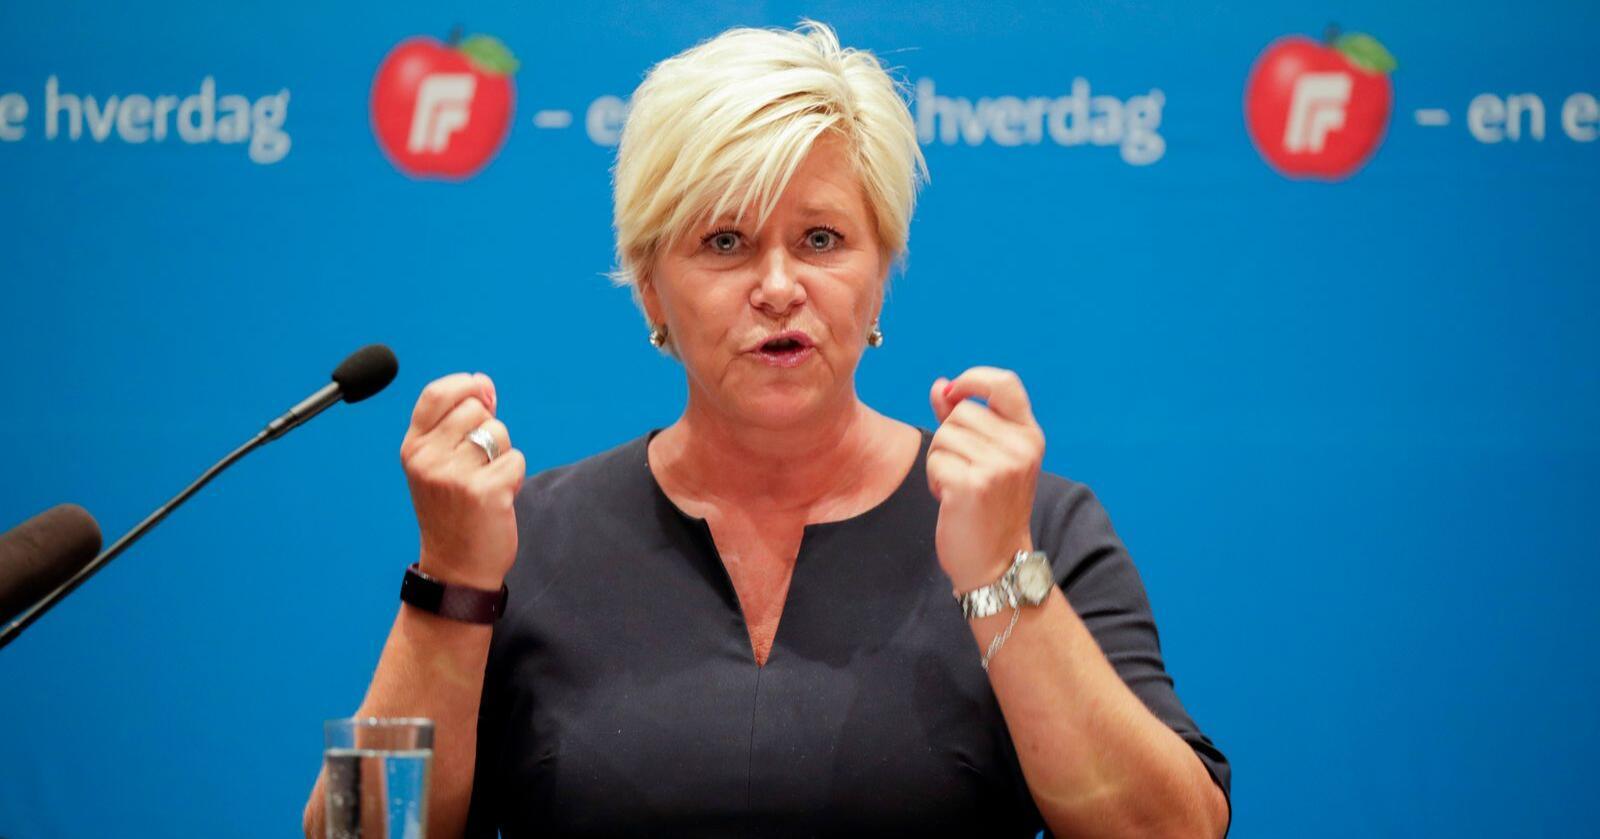 Frp-leder Siv Jensen taler til Fremskrittspartiets landsstyre på Gardermoen. Foto: Vidar Ruud / NTB scanpix